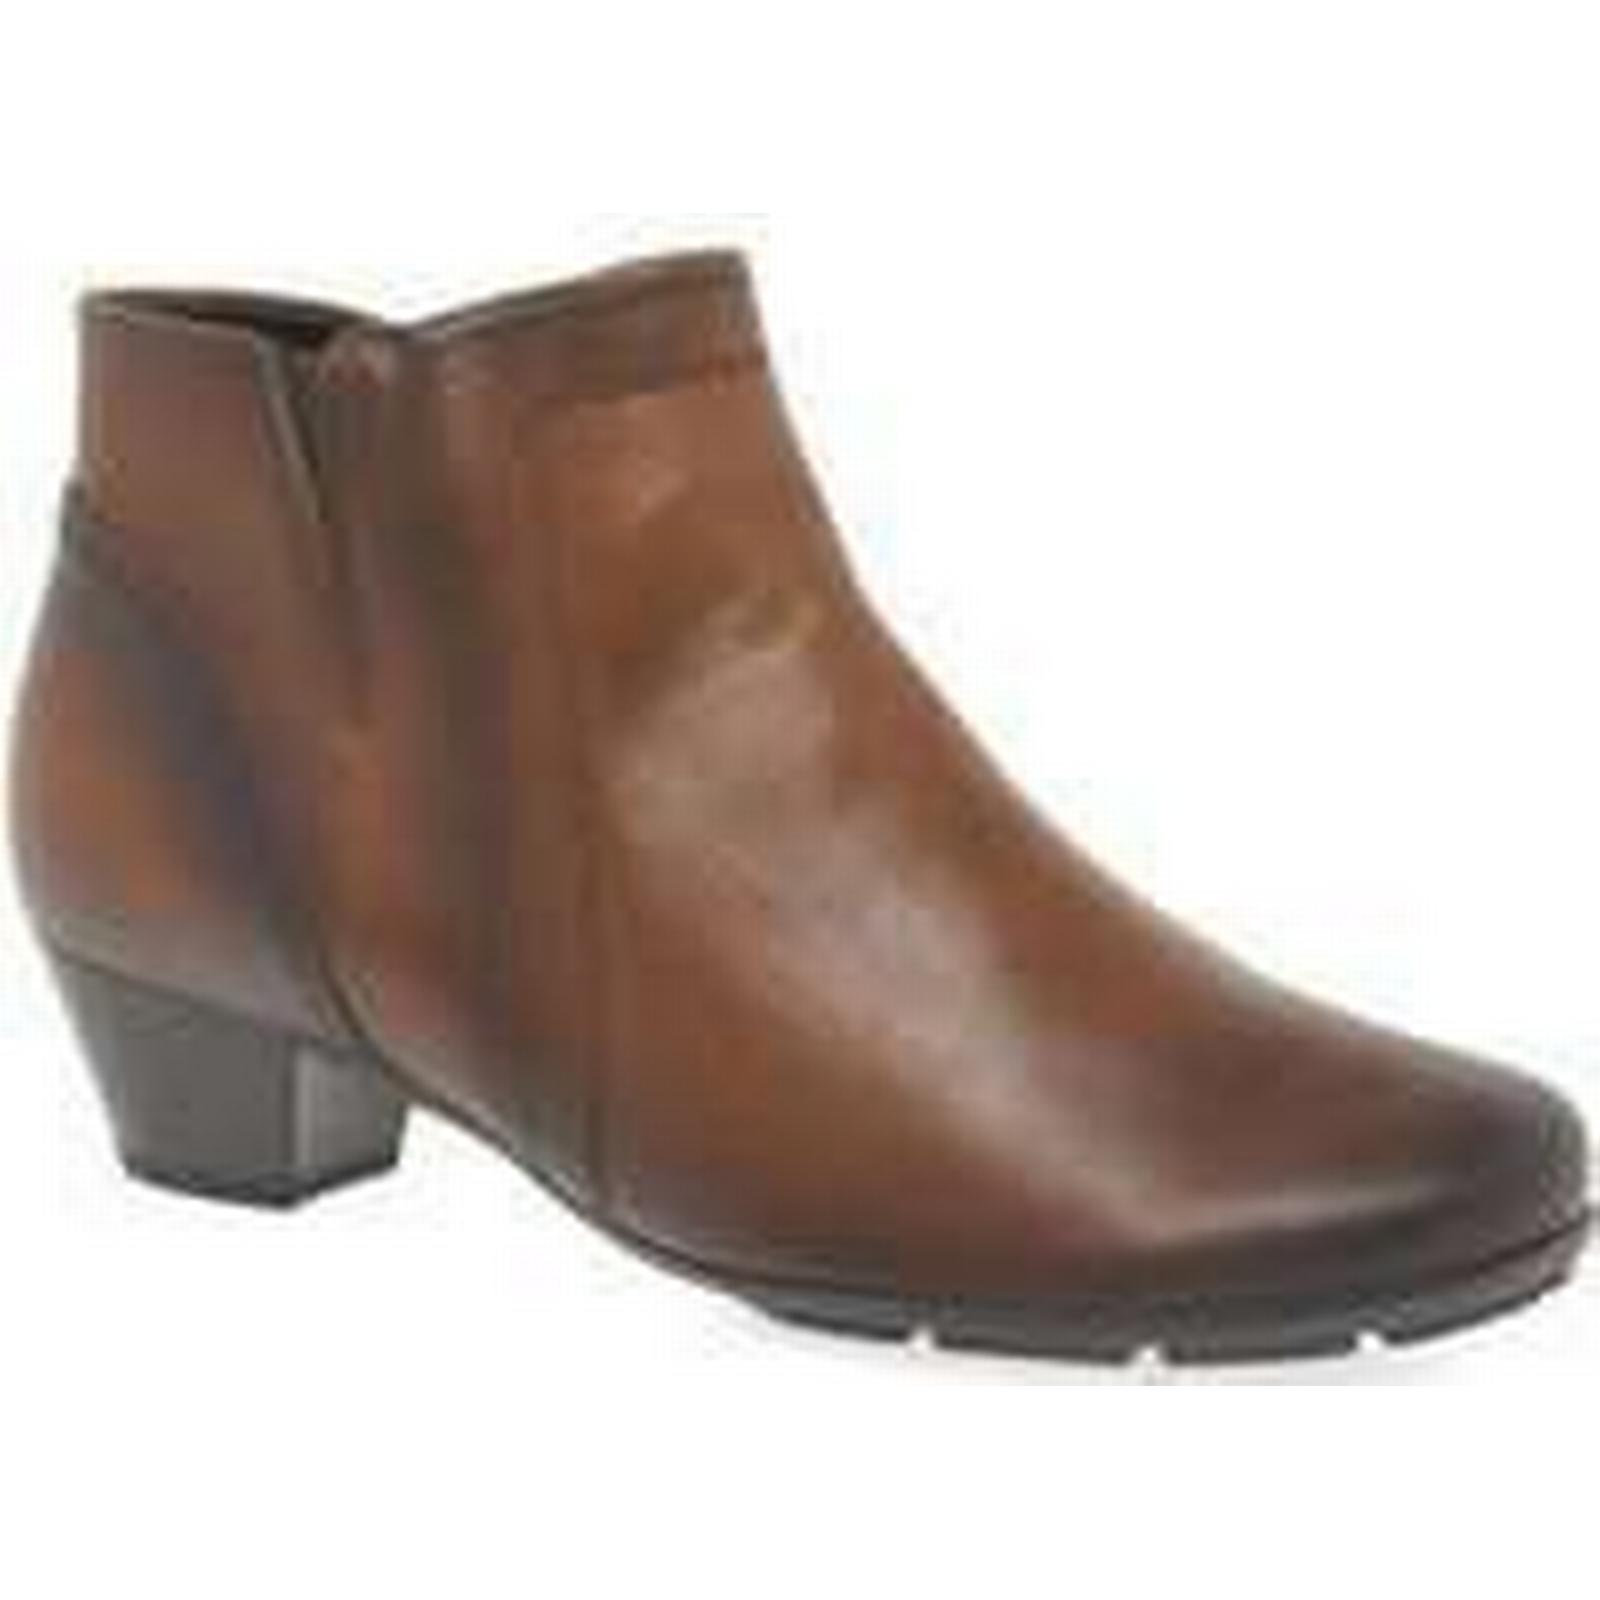 Spartoo.co.uk Gabor women's Heritage Womens Ankle Boots women's Gabor Low Ankle Boots in Brown a112b0